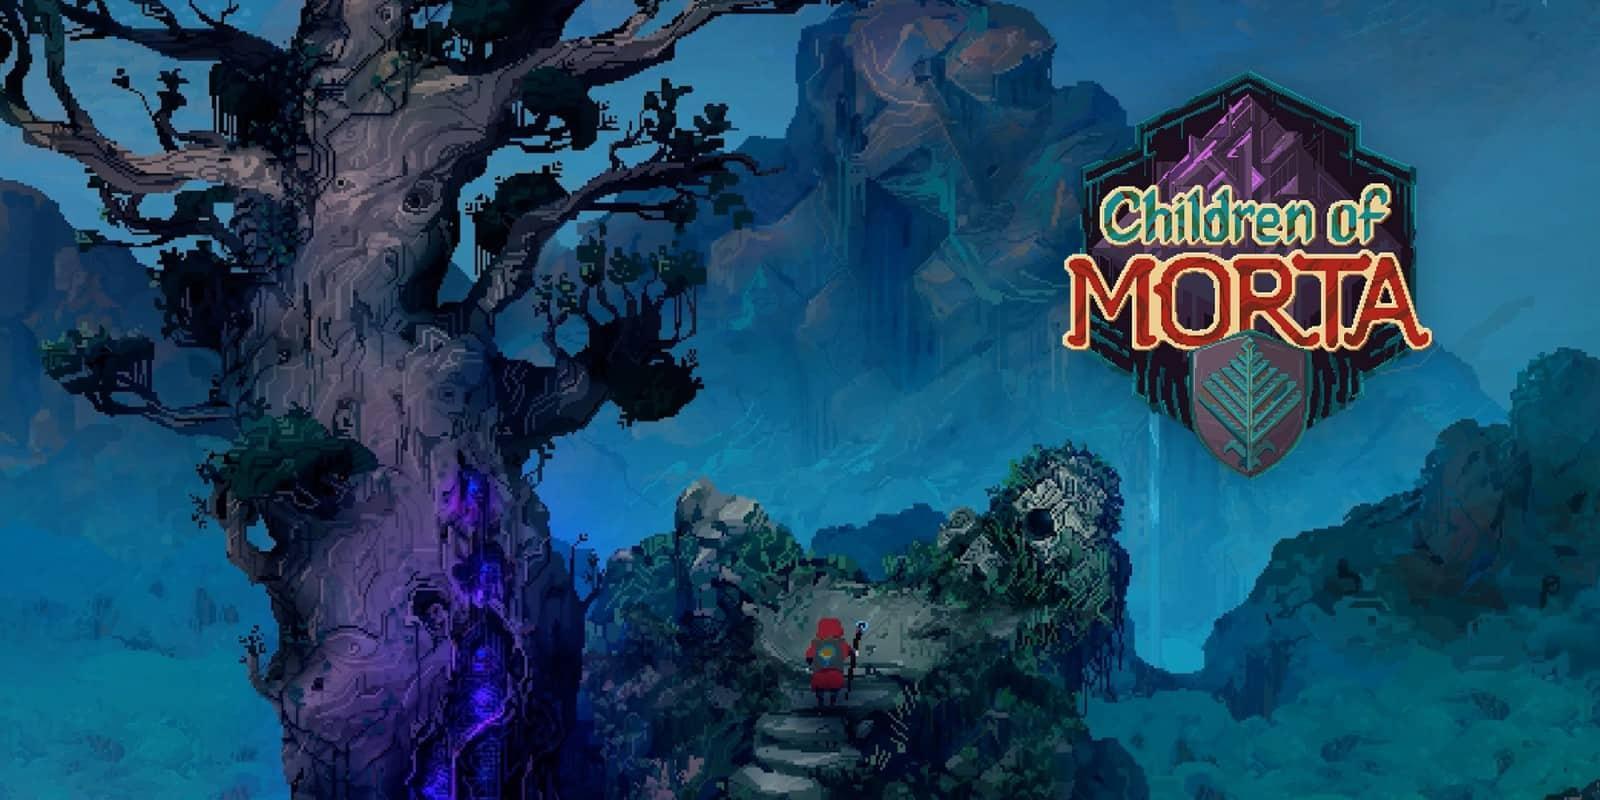 Children of Morta PC Version Game Free Download